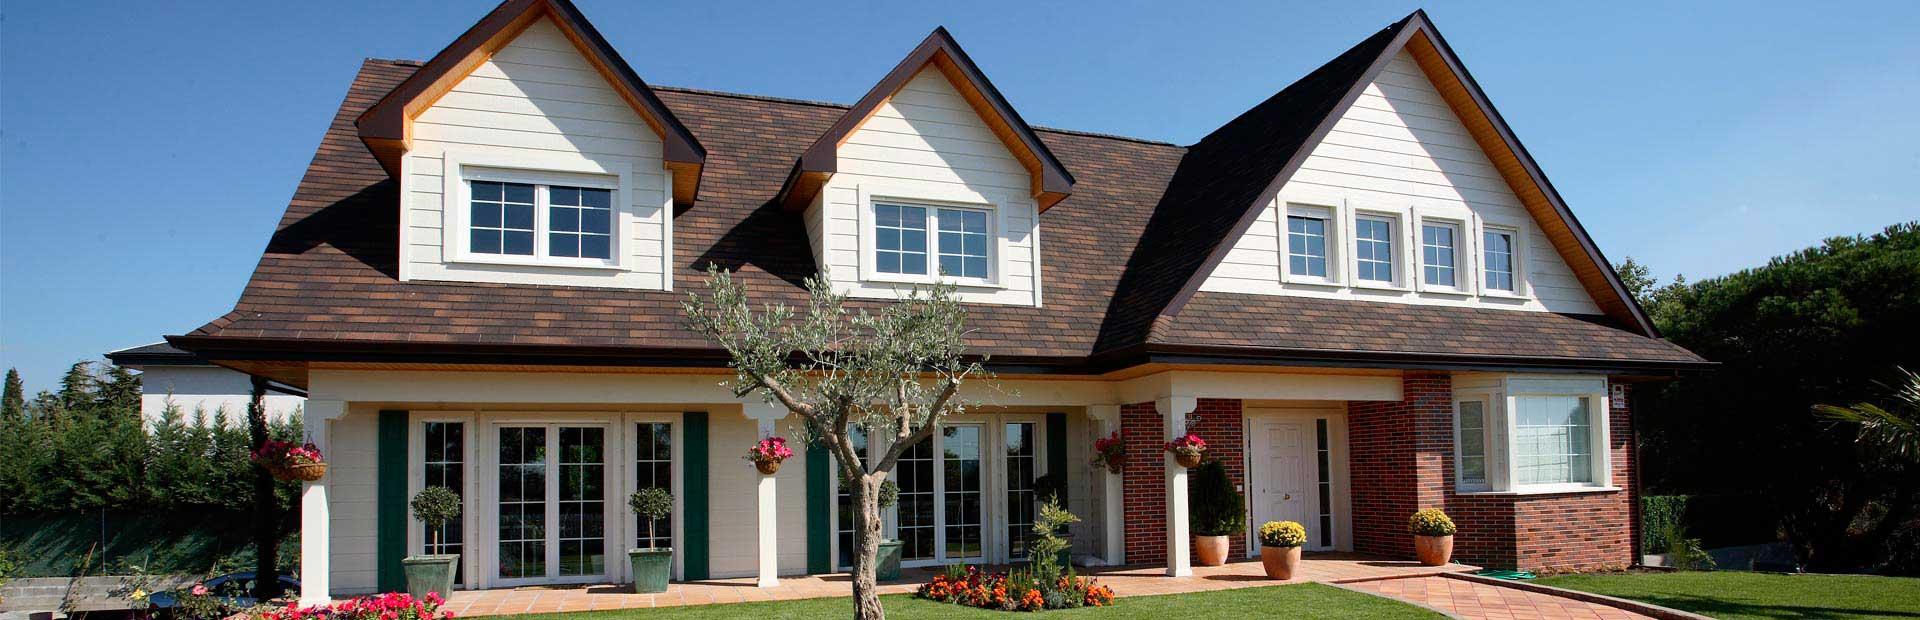 casas de madera madrid